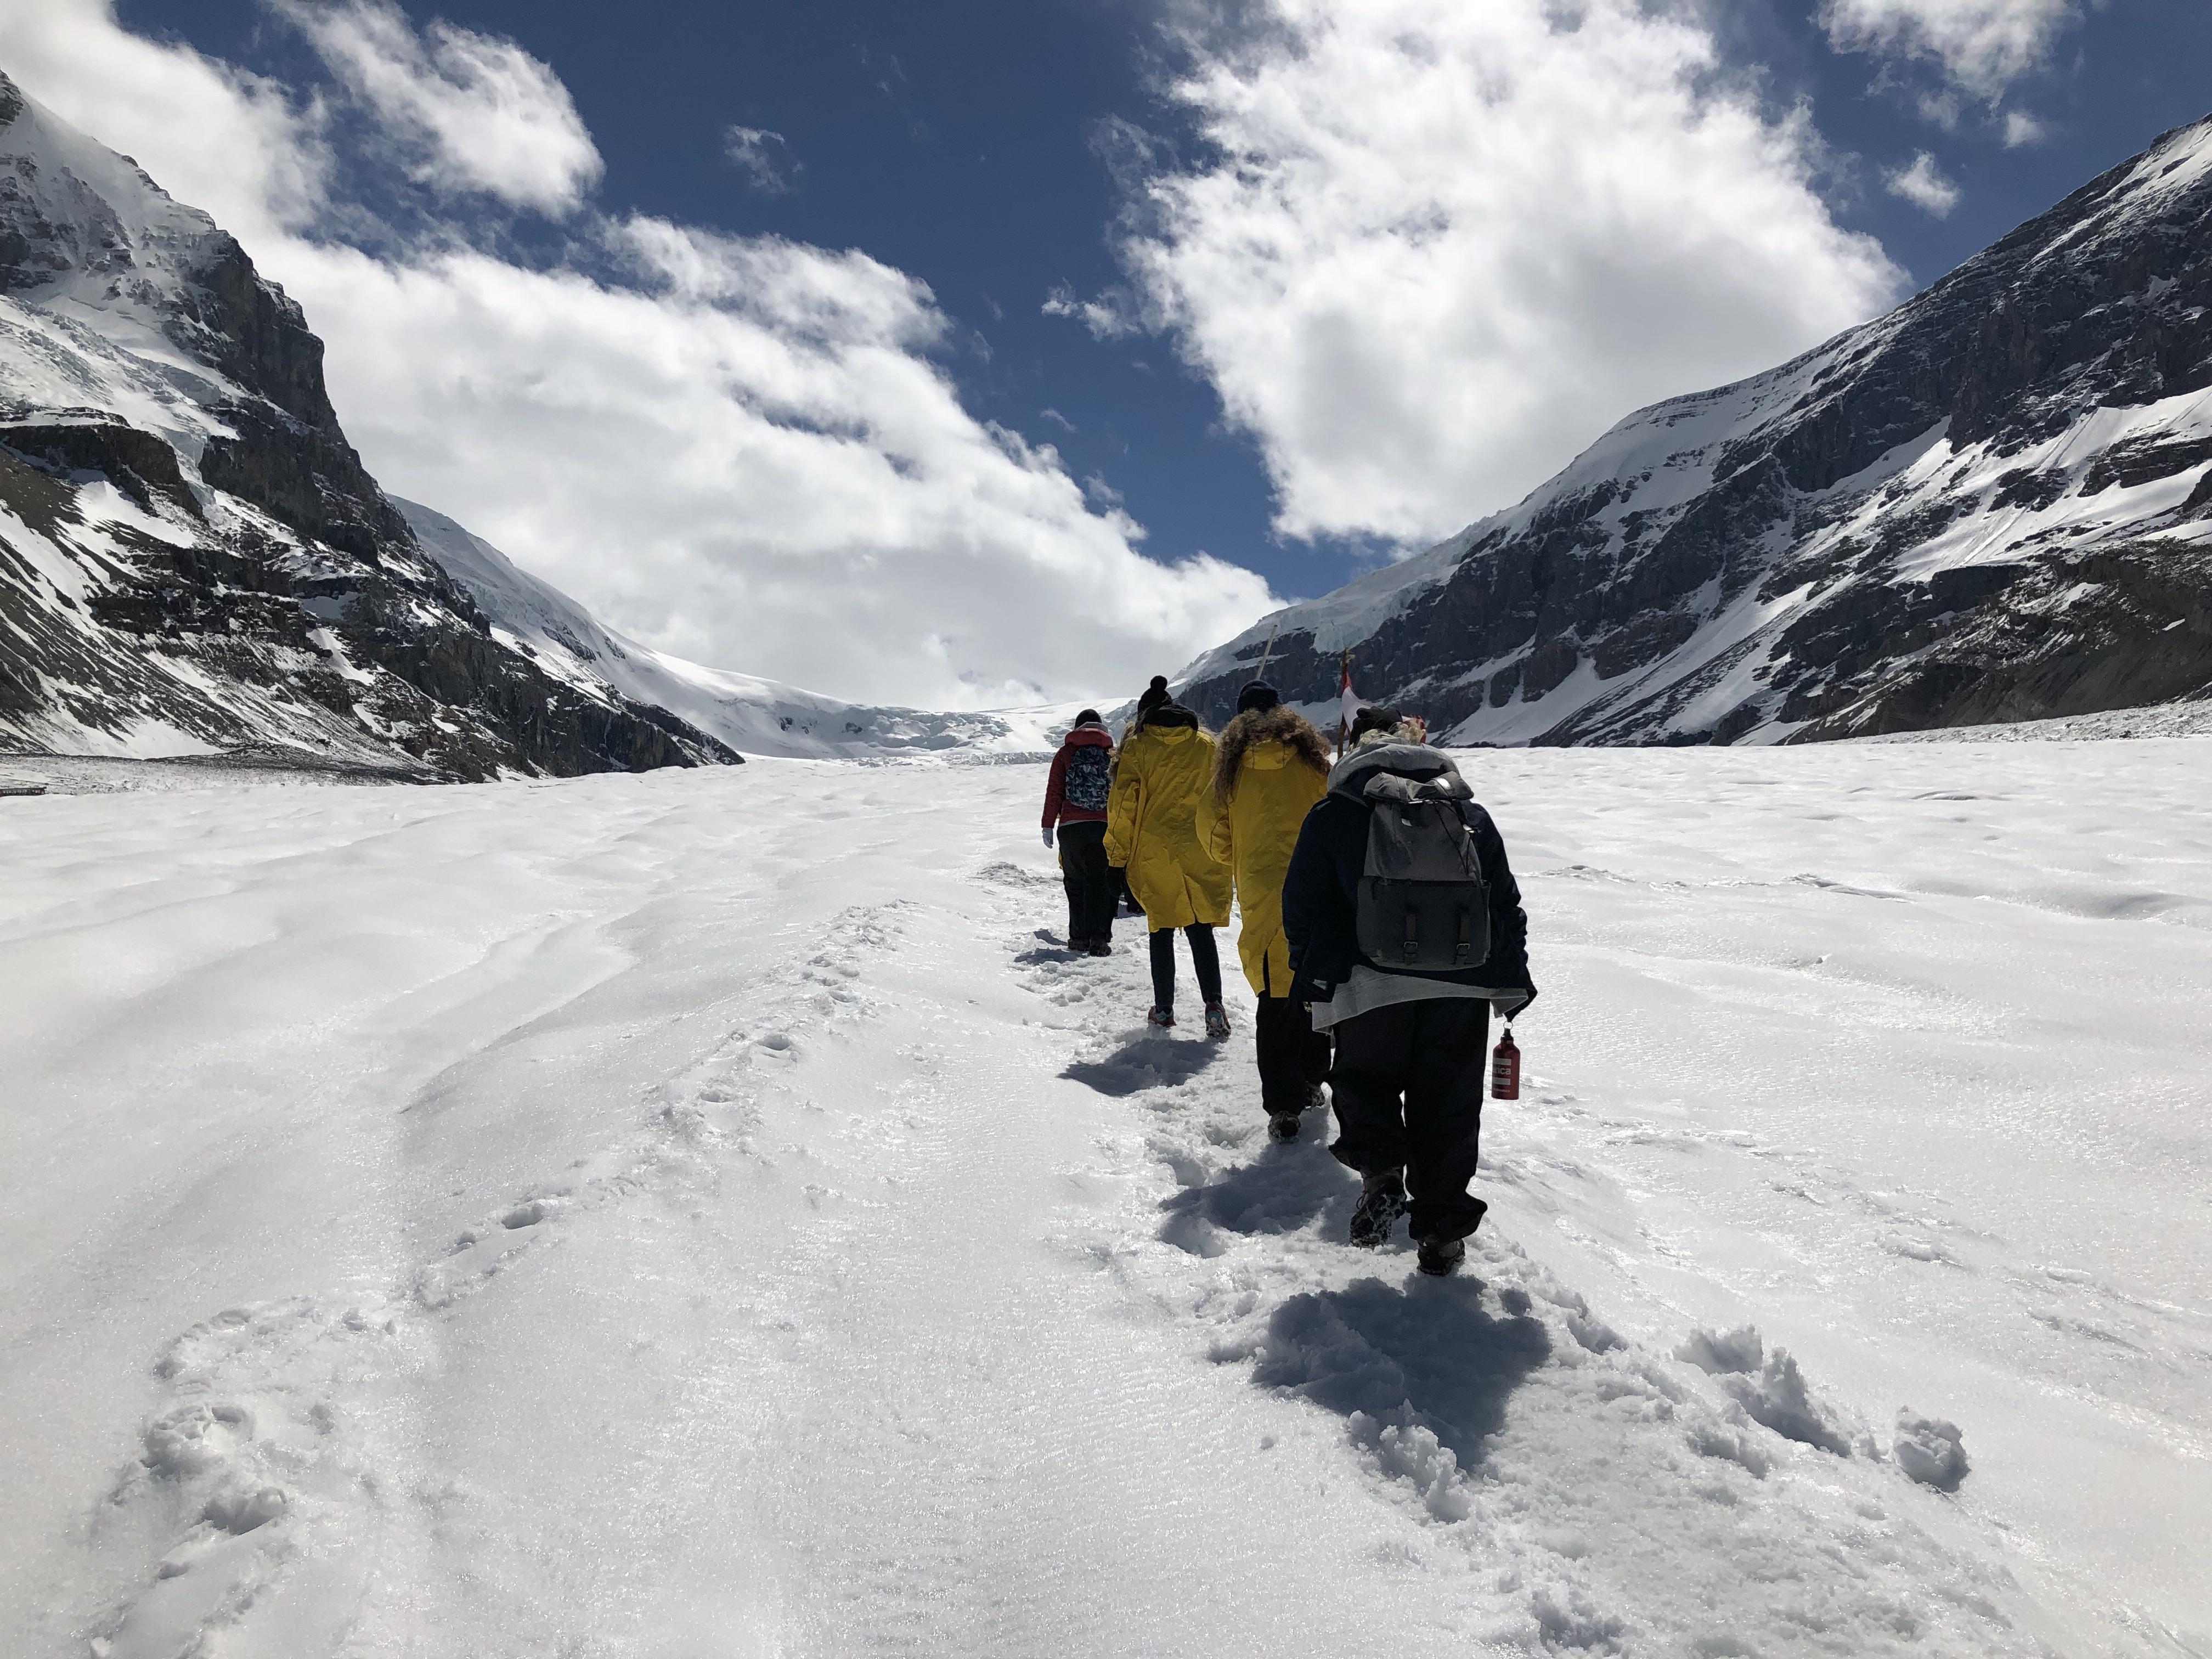 Canada Rockies TrekAmerica Itrekhere 2018 303